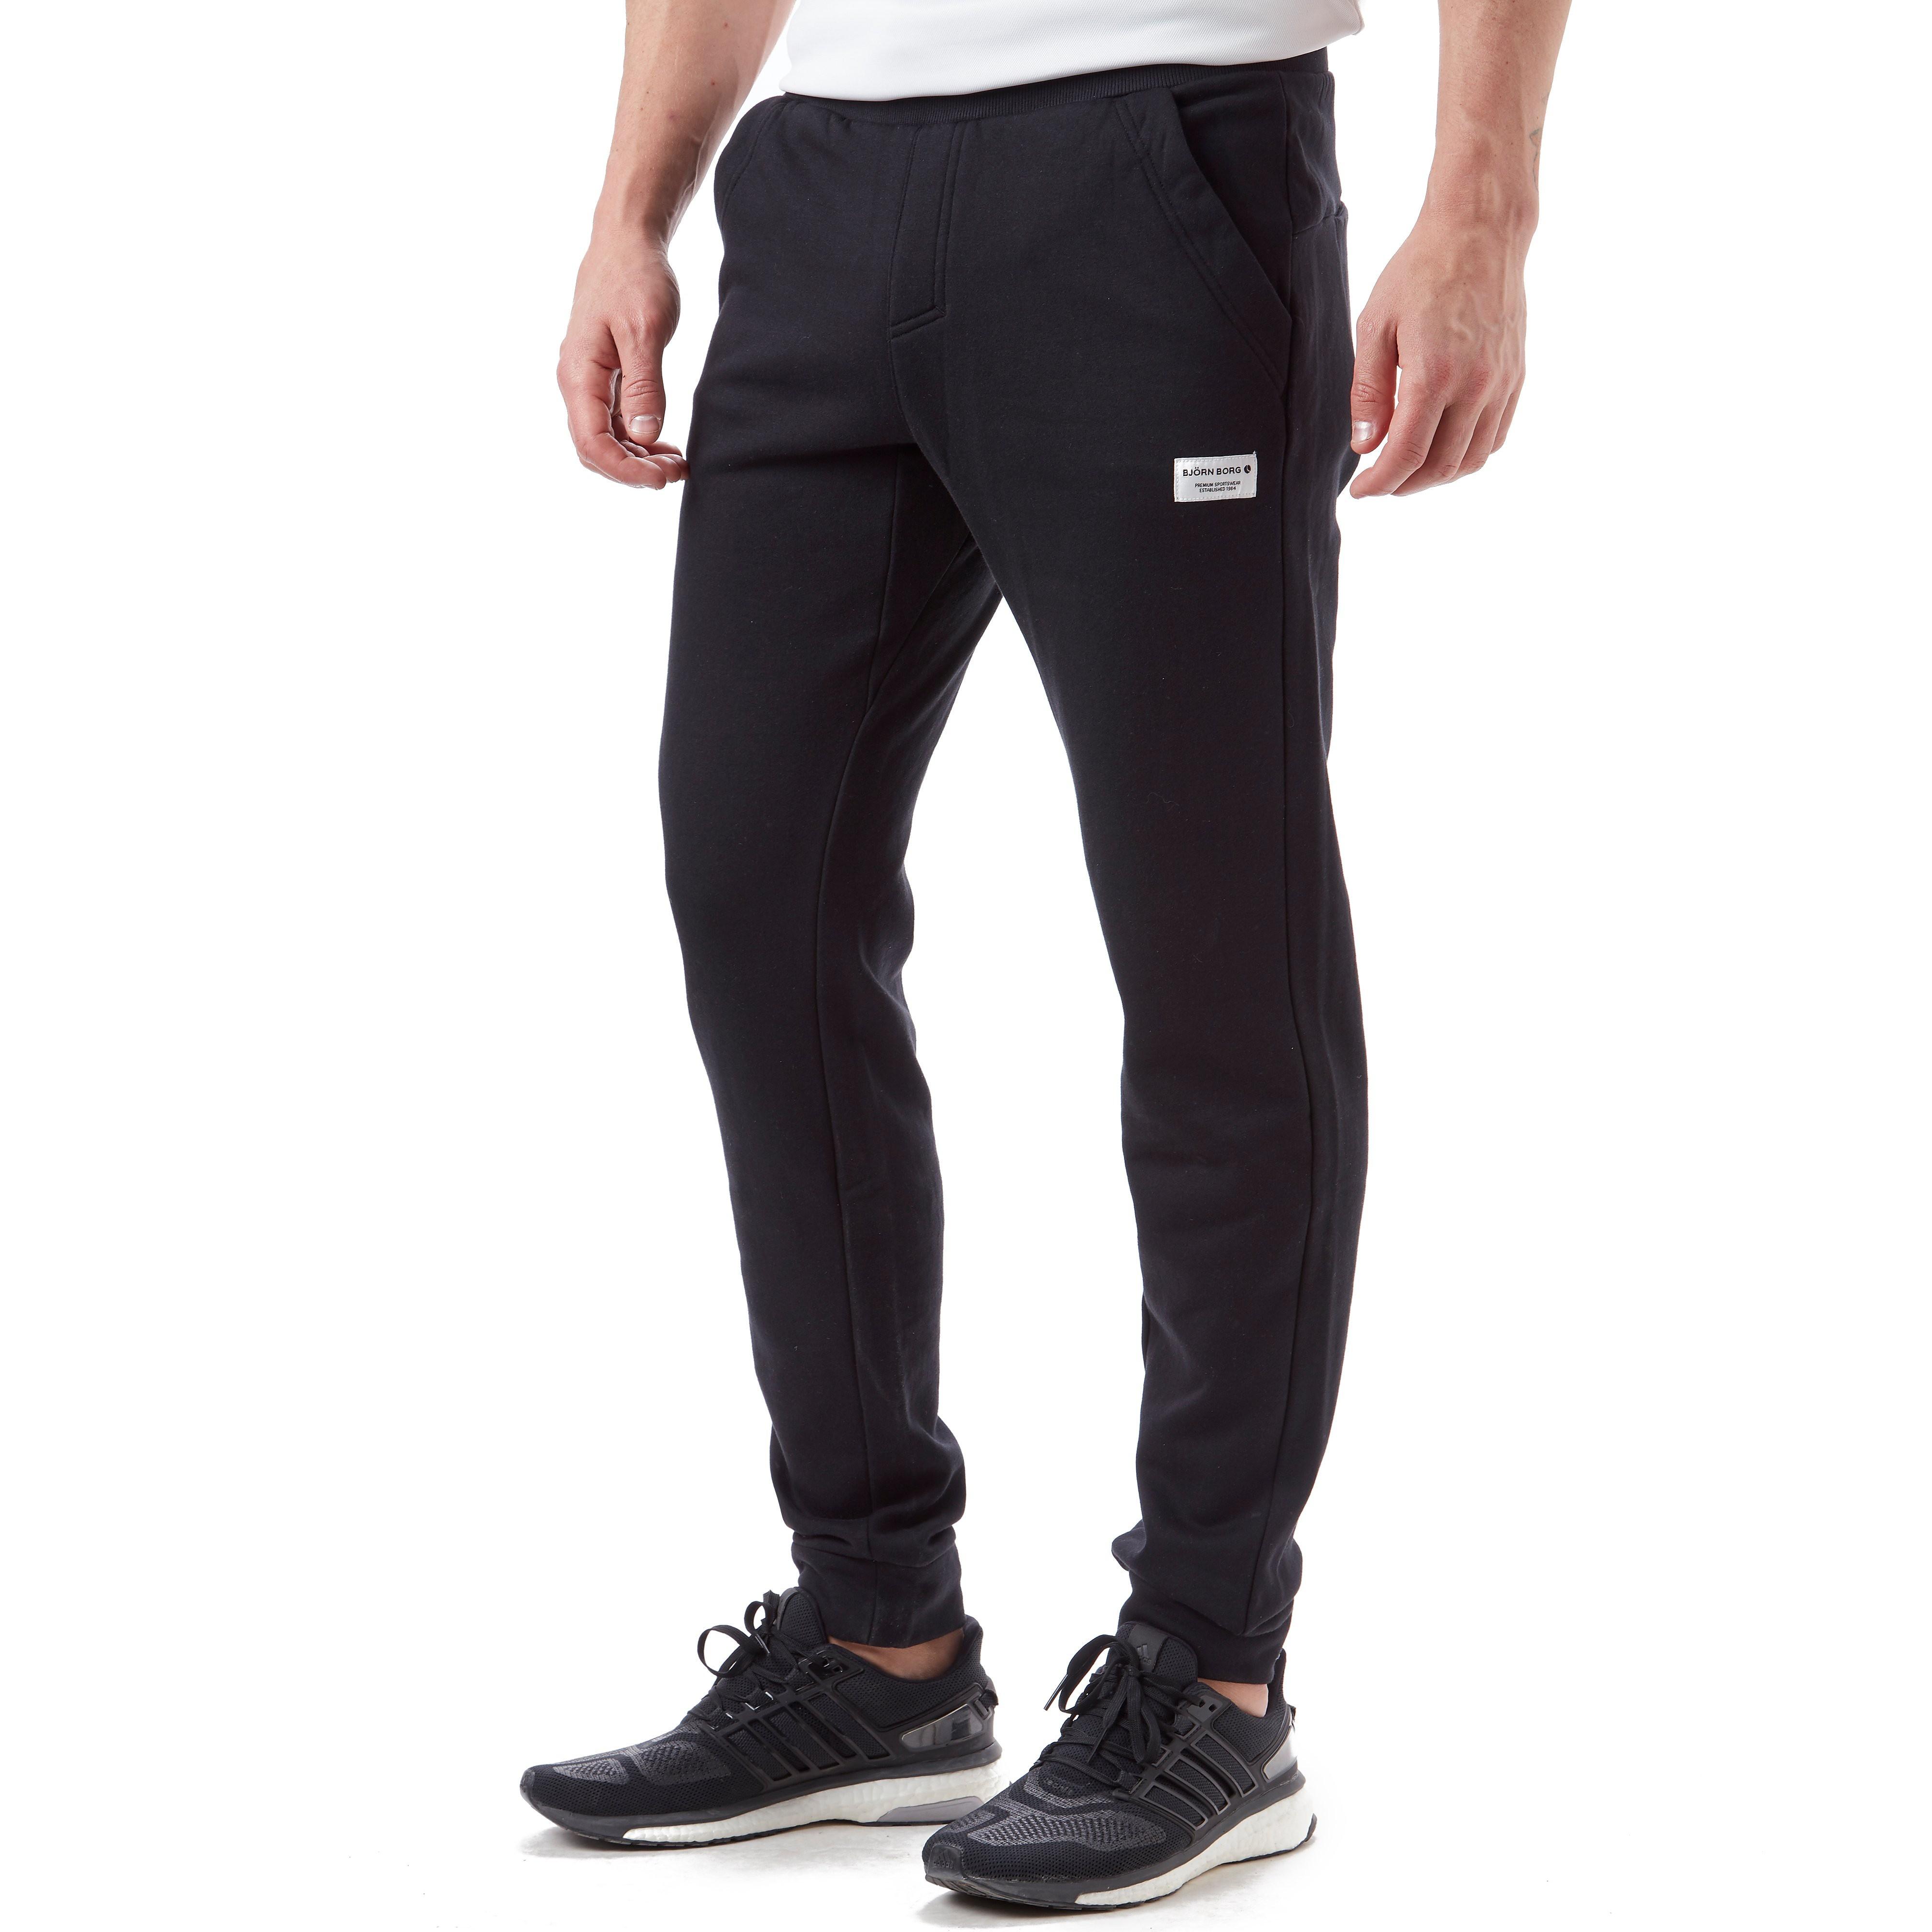 Bjorn Borg Centre Men's Training Pants